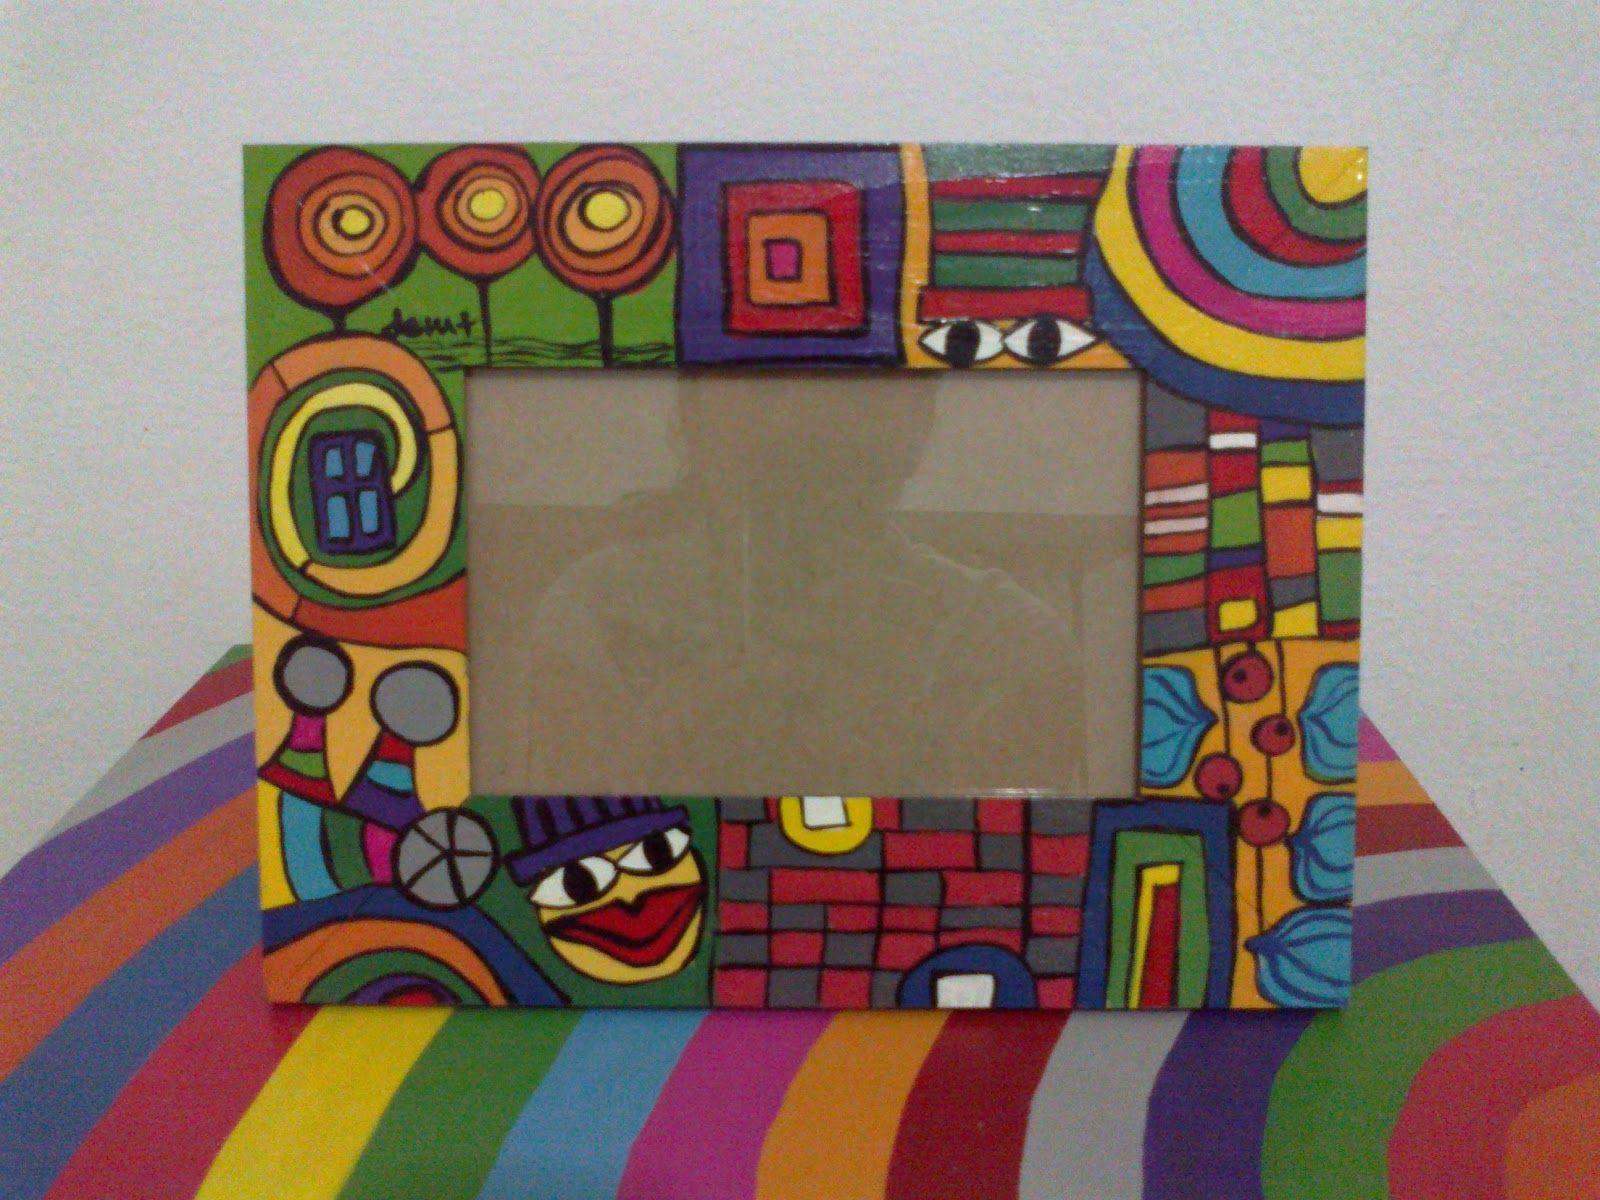 Love the colors | Espejos y marcos | Pinterest | Espejo, Marco ...